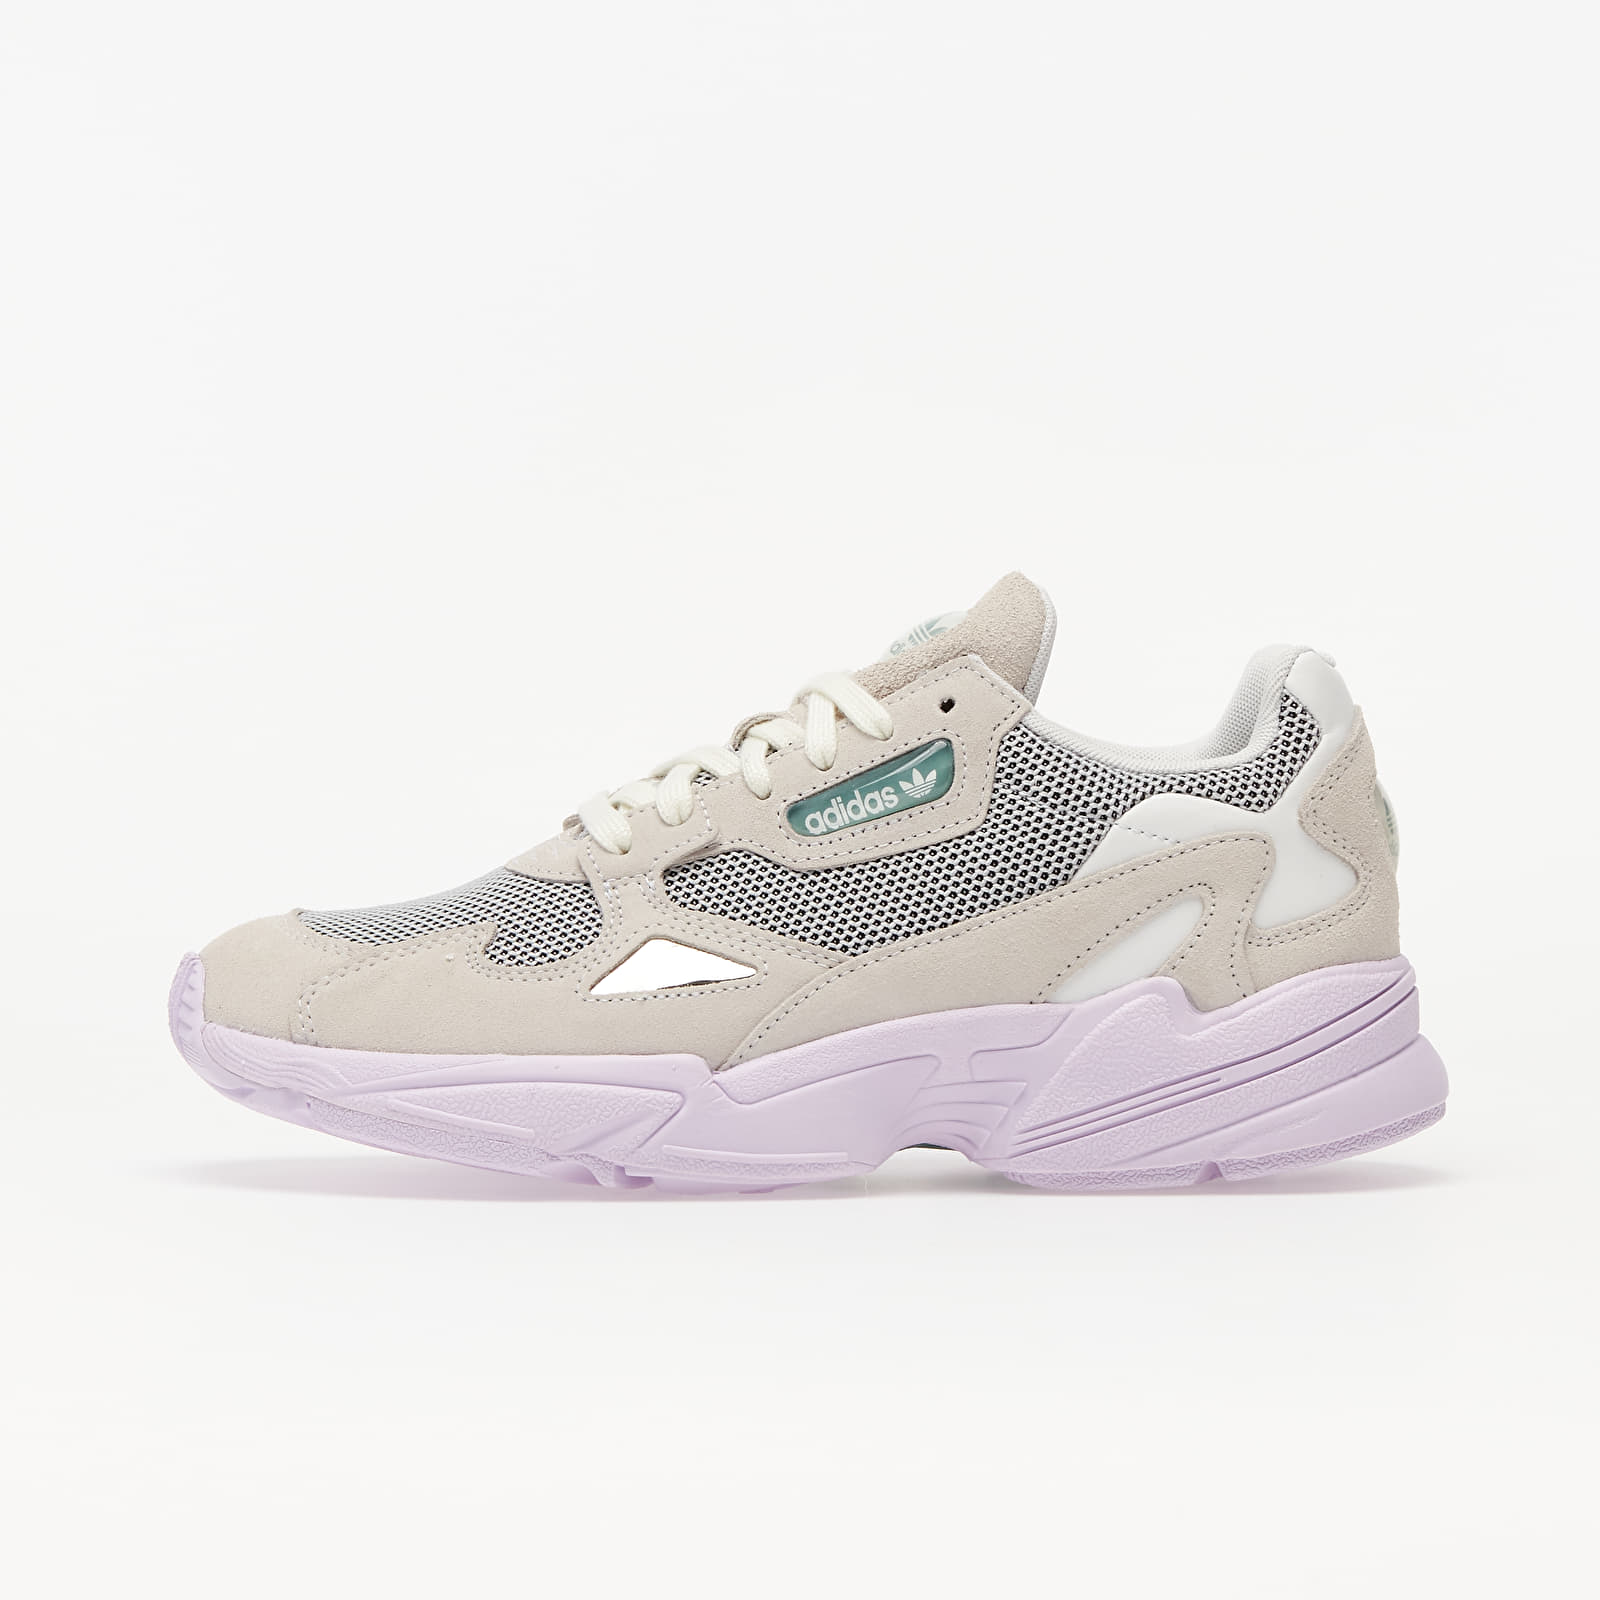 Women's shoes adidas Falcon W Supplier